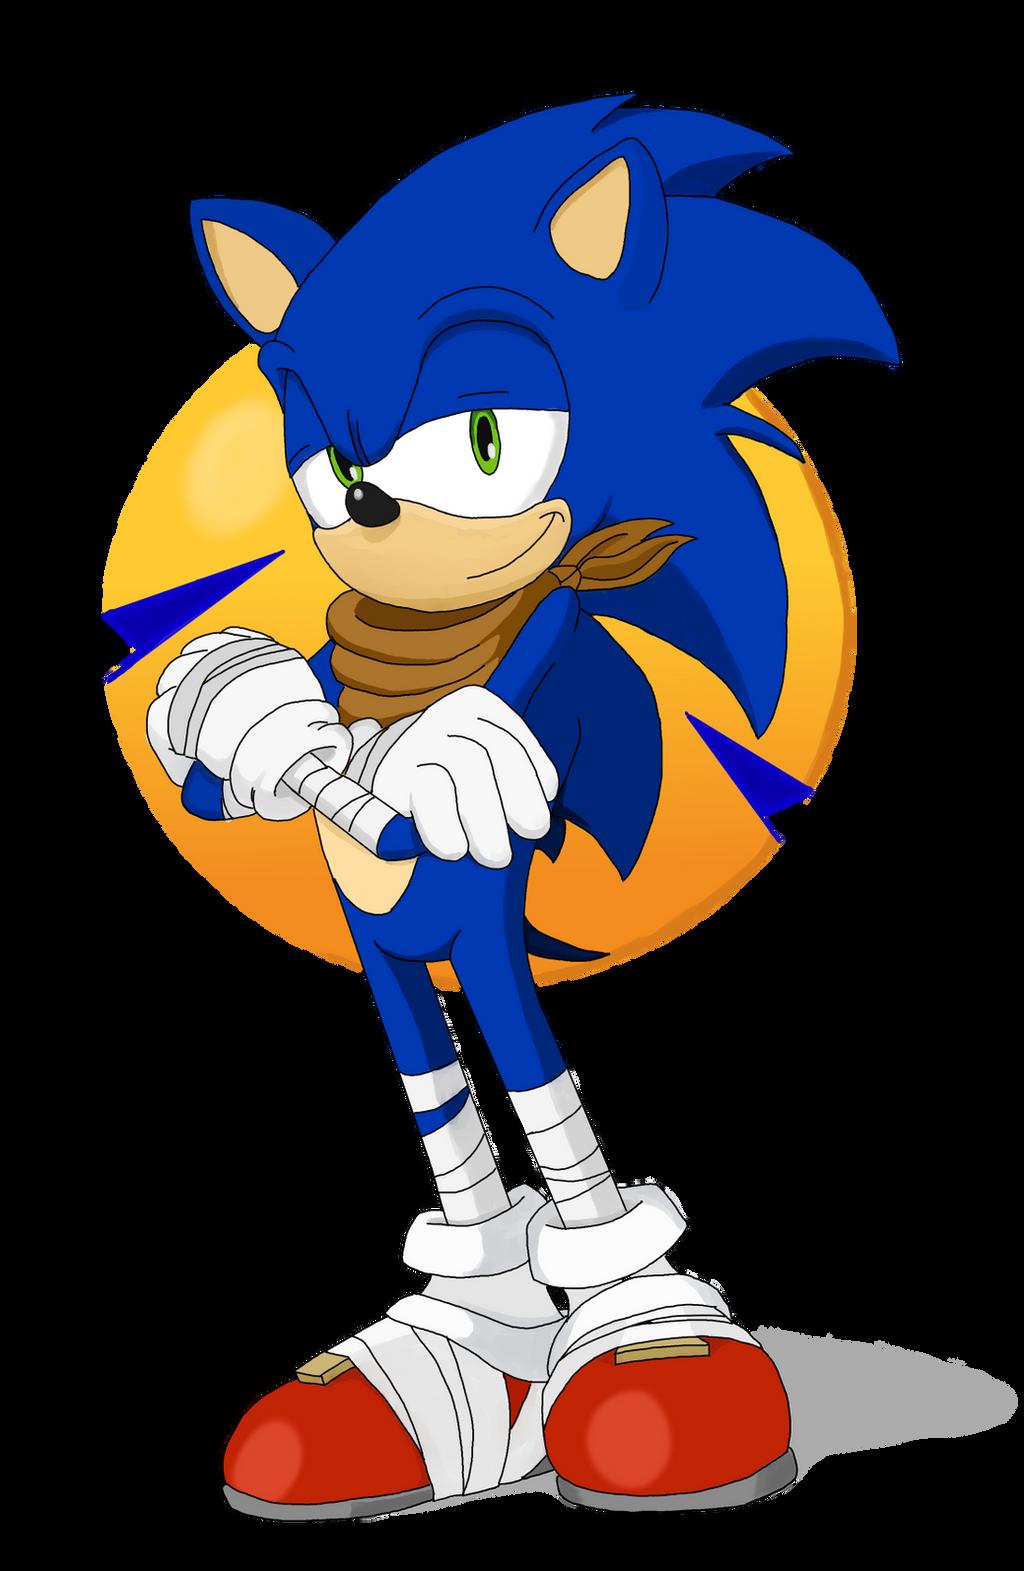 Sonic Boom: Sonic the Hedgehog by SpongeDudeCoolPants